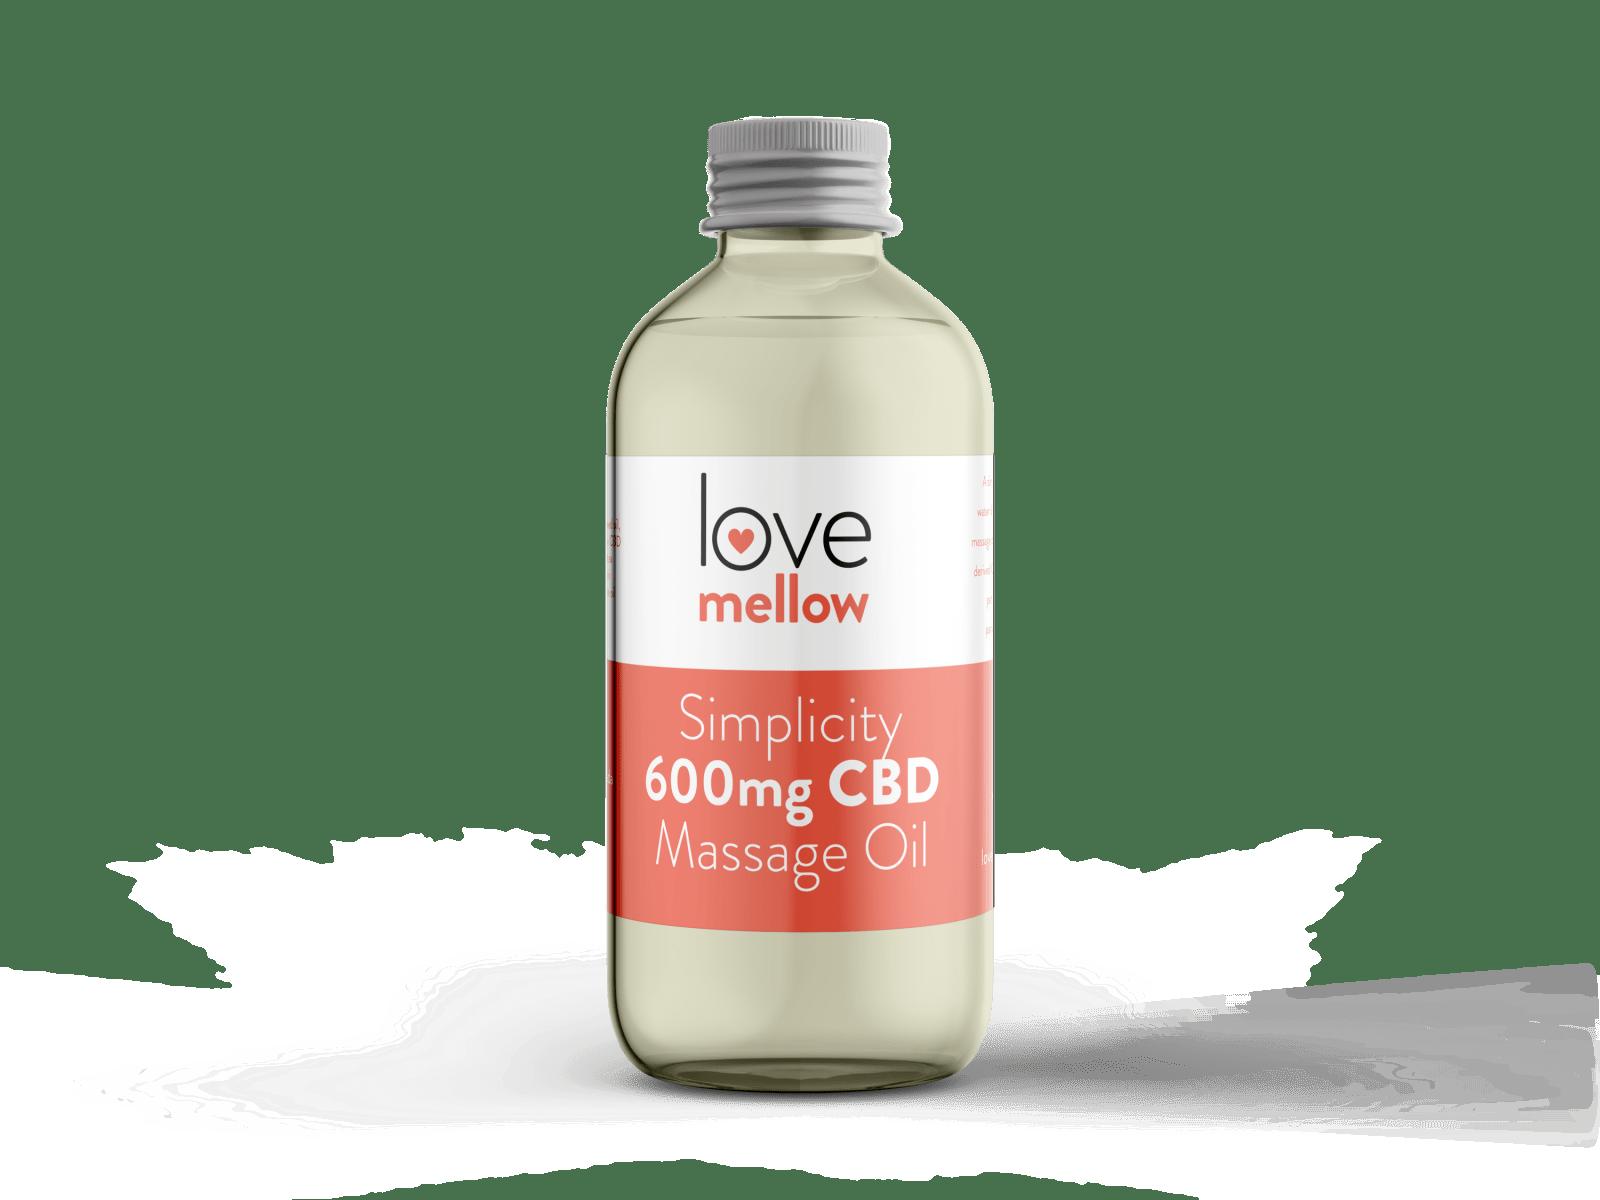 img_lovemellow_massage_oil_600mg_CBD_8oz_bottle